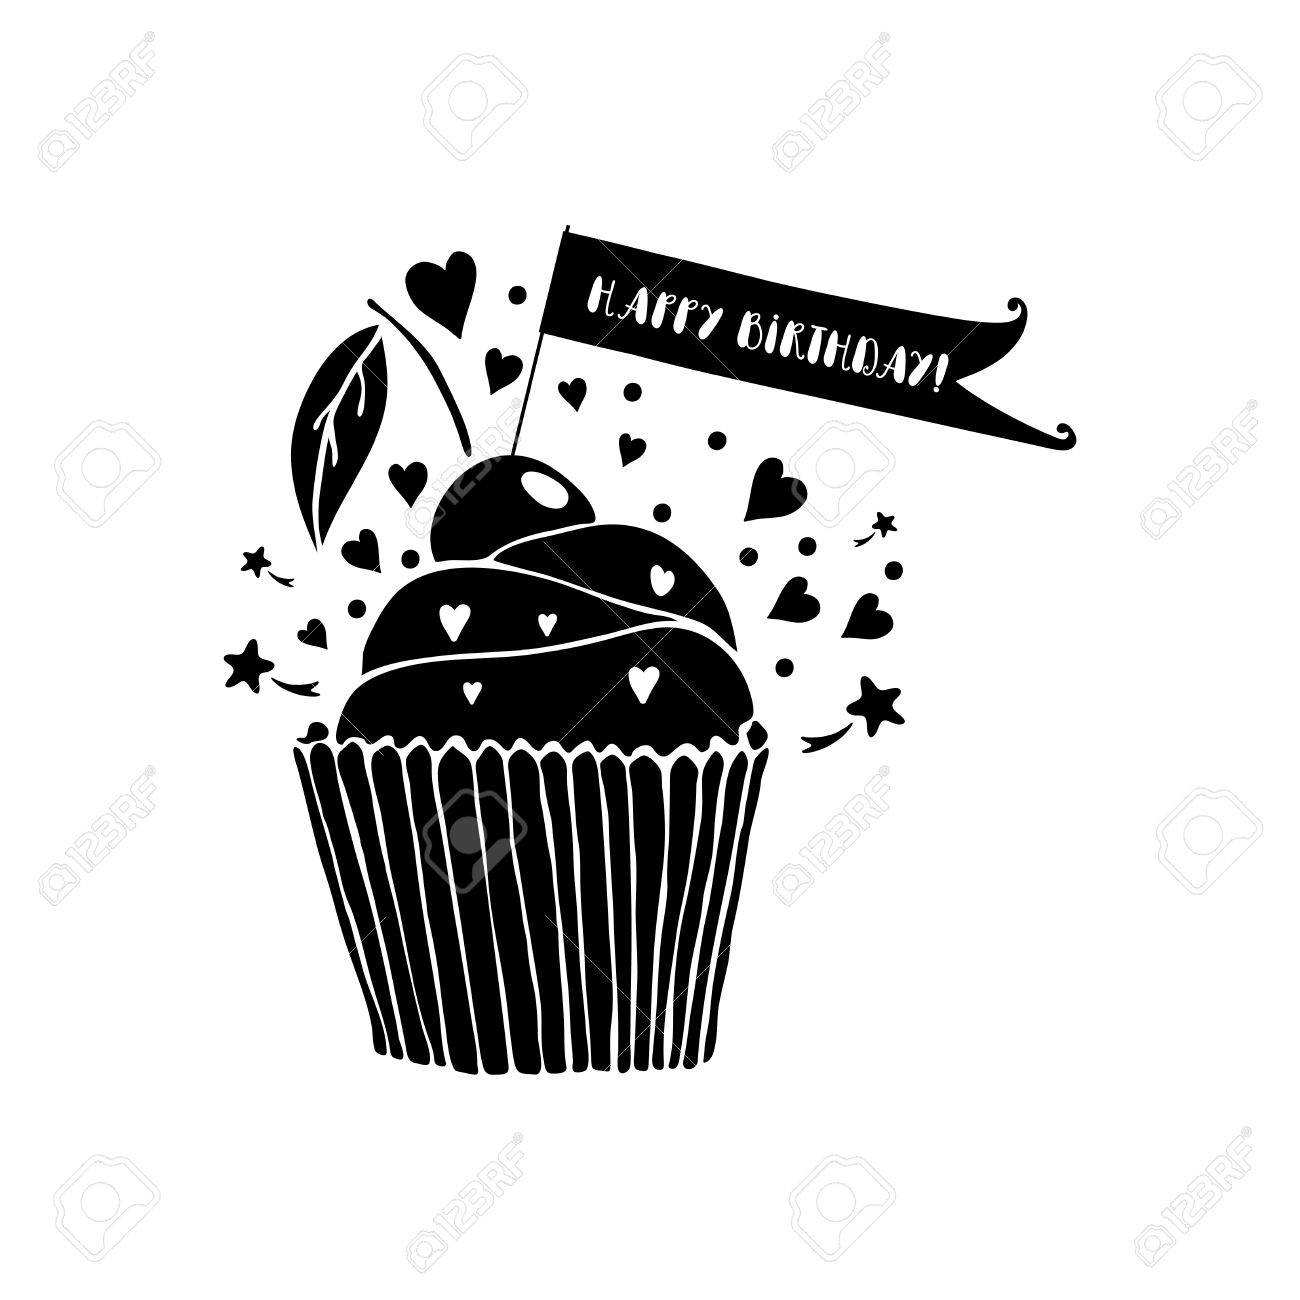 66 Customize Happy Birthday Card Template Black And White for Ms Word by Happy Birthday Card Template Black And White